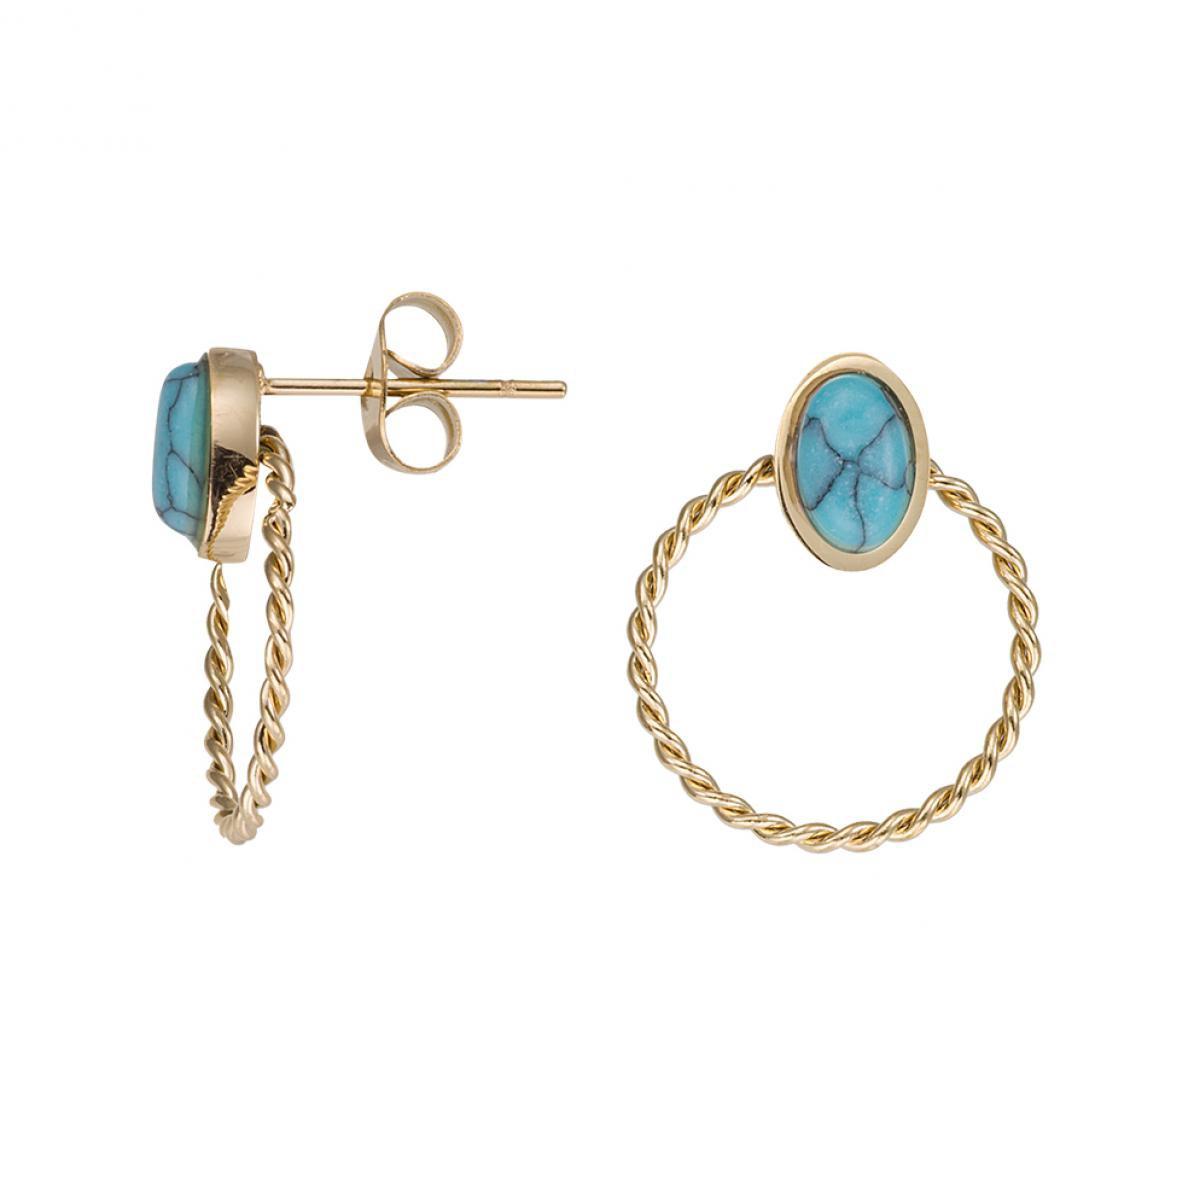 Boucles d'oreilles Bijoux 608119 - Go Mademoiselle - Modalova